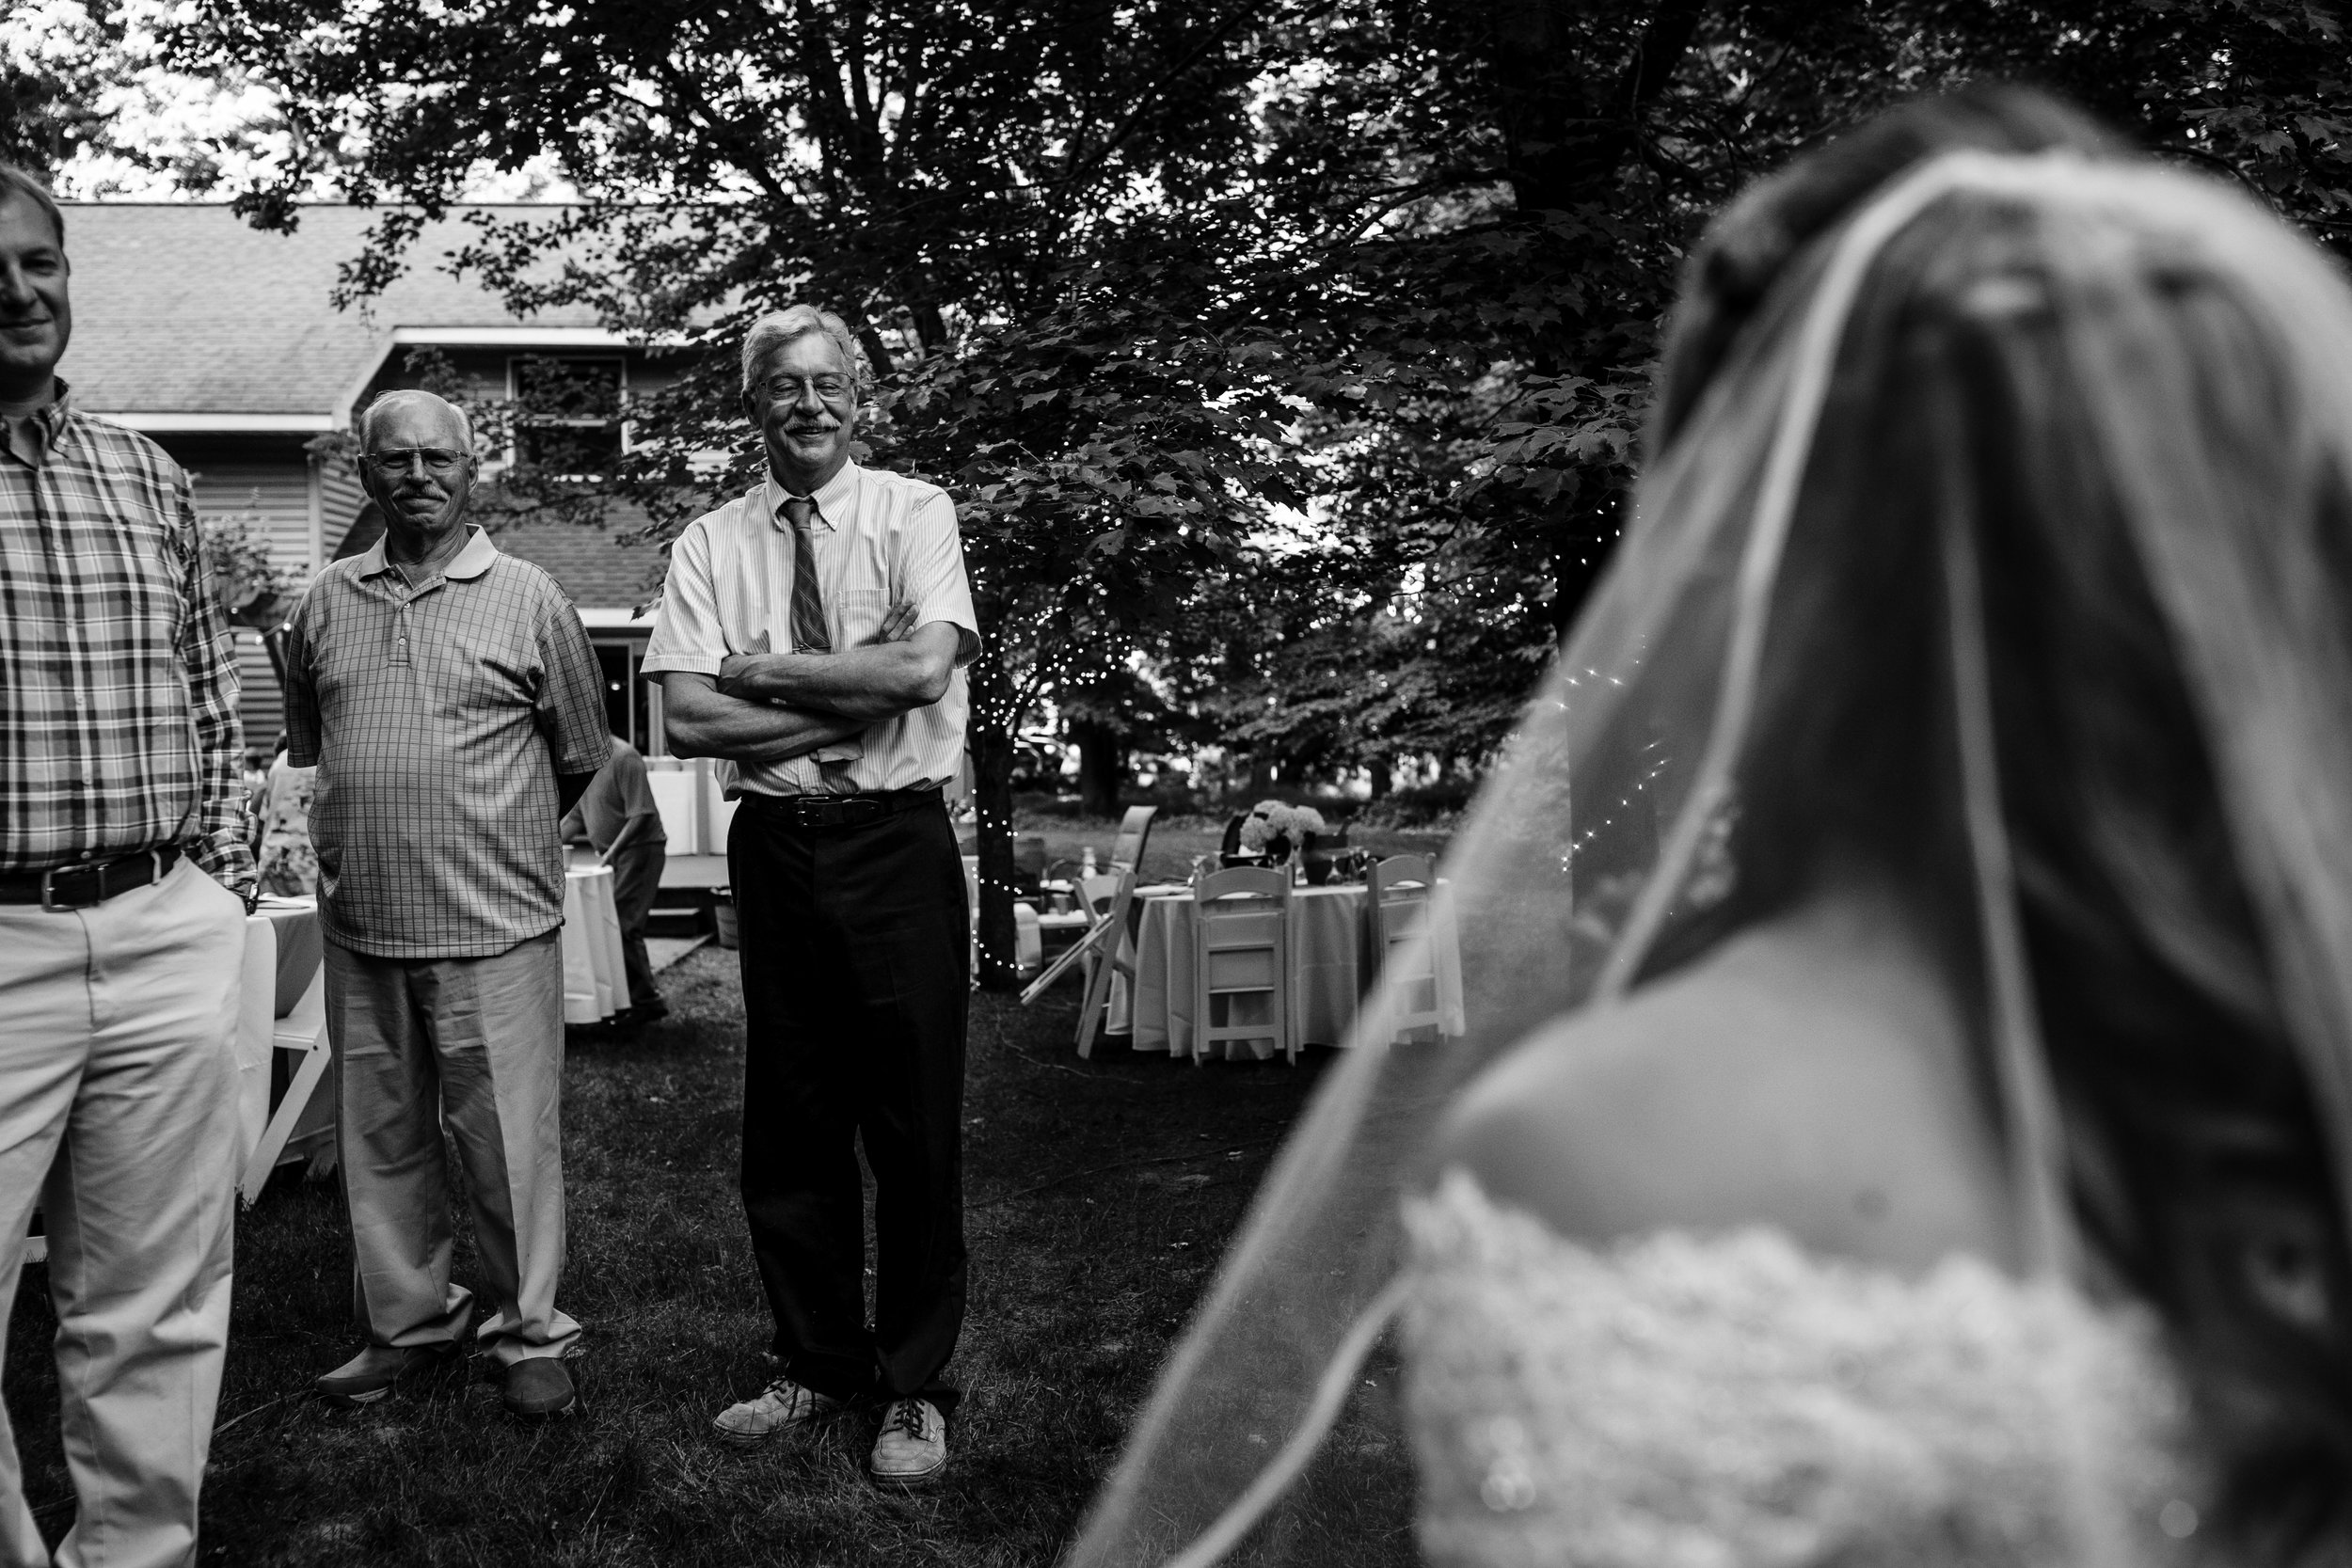 ludington-michigan-intimate-backyard-wedding-jessica-nolan312.jpg